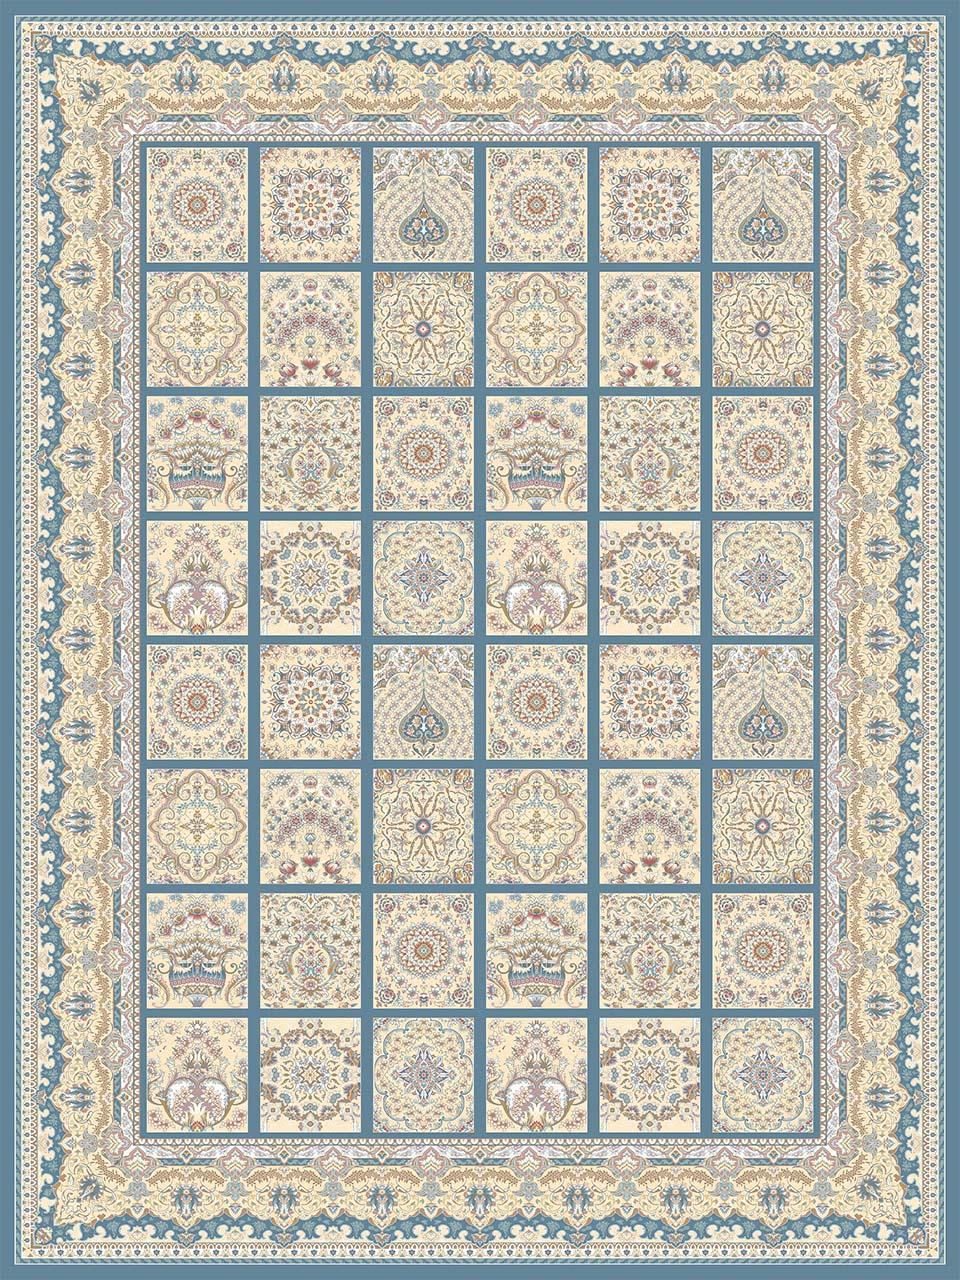 فرش (26001) اکریلیک - 8 رنگ - 700 شانه - آبي تيره - تراکم 2550